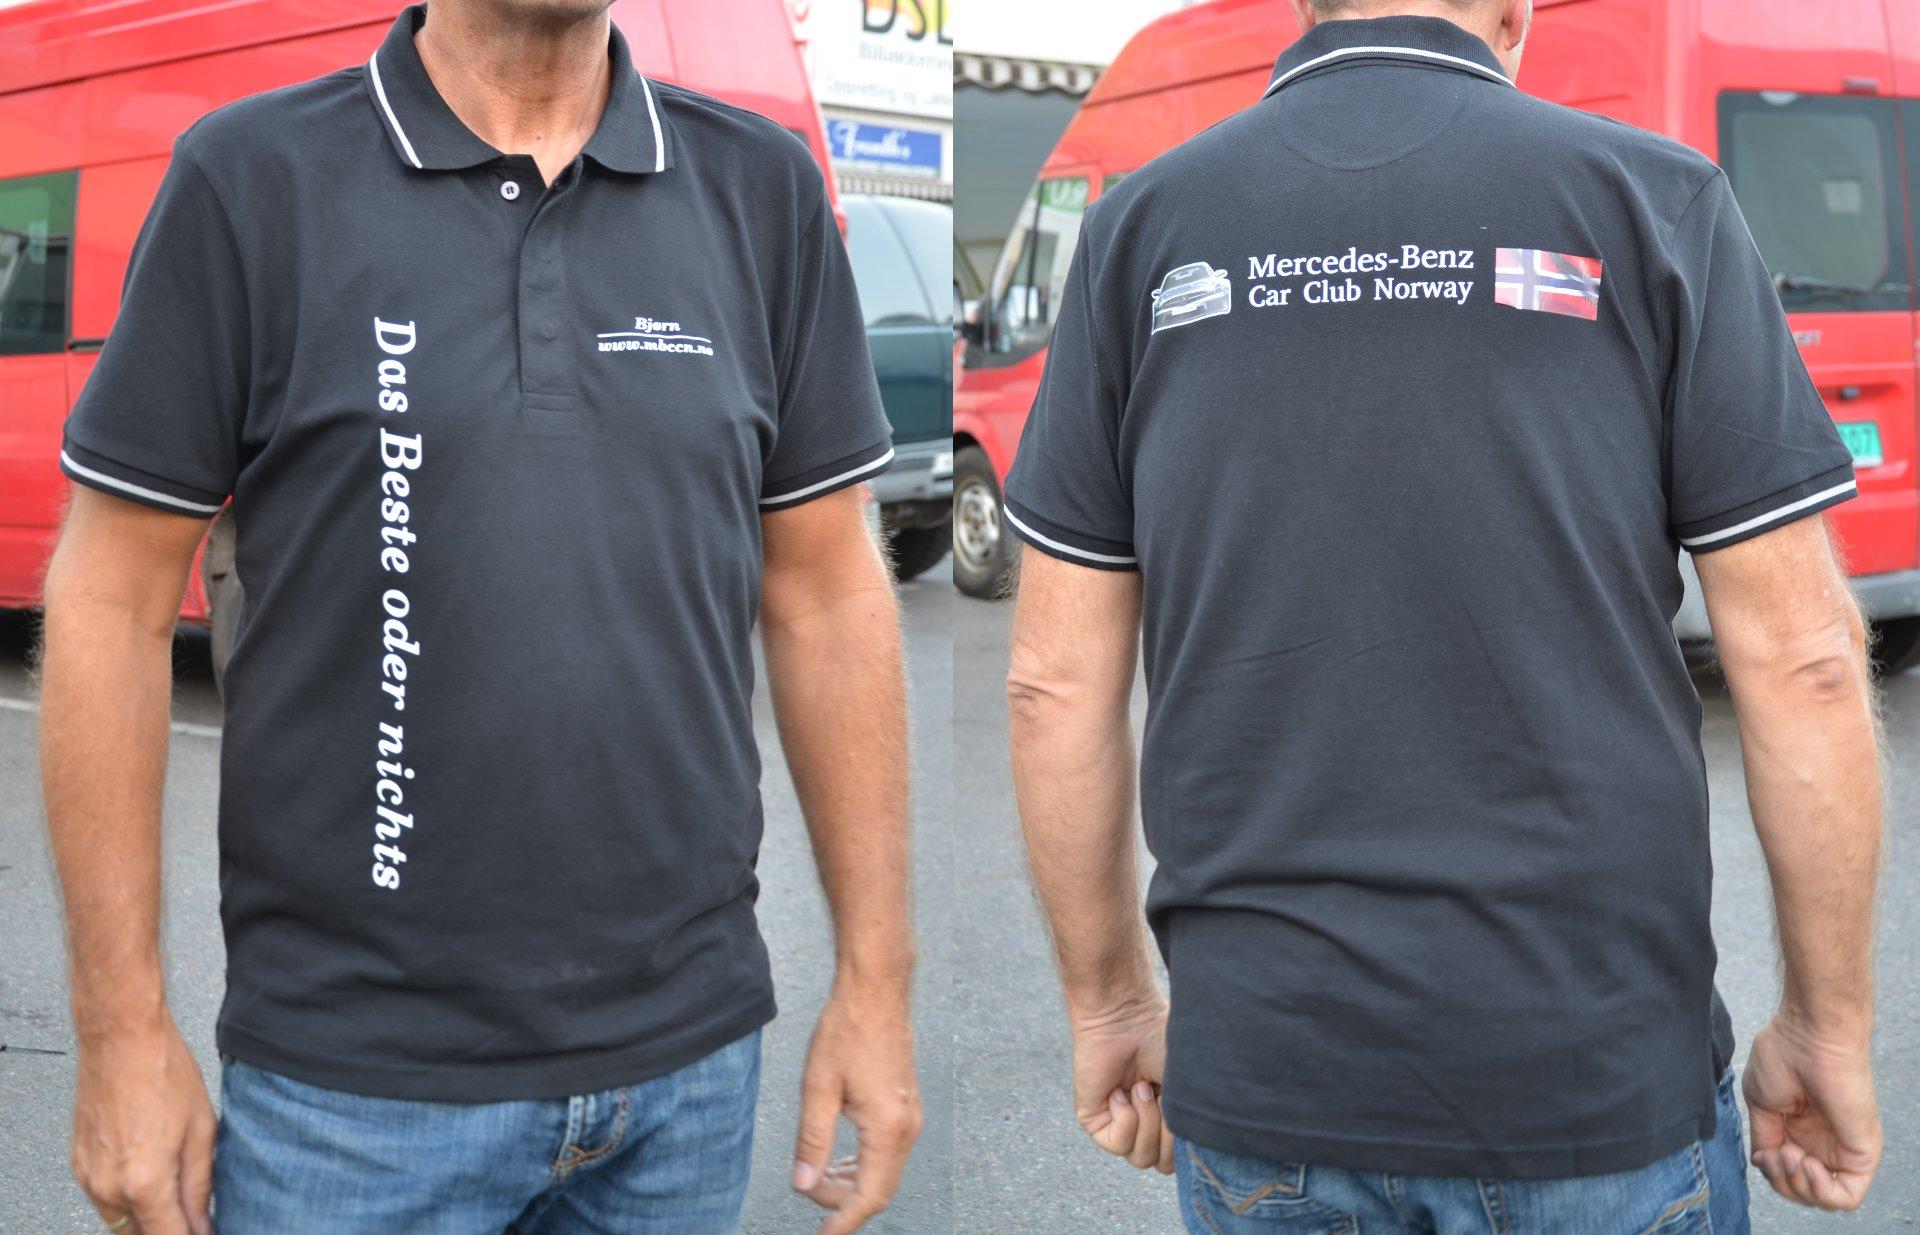 Piquet skjorte ♀ og ♂ – Mercedes Benz Car Club Norway